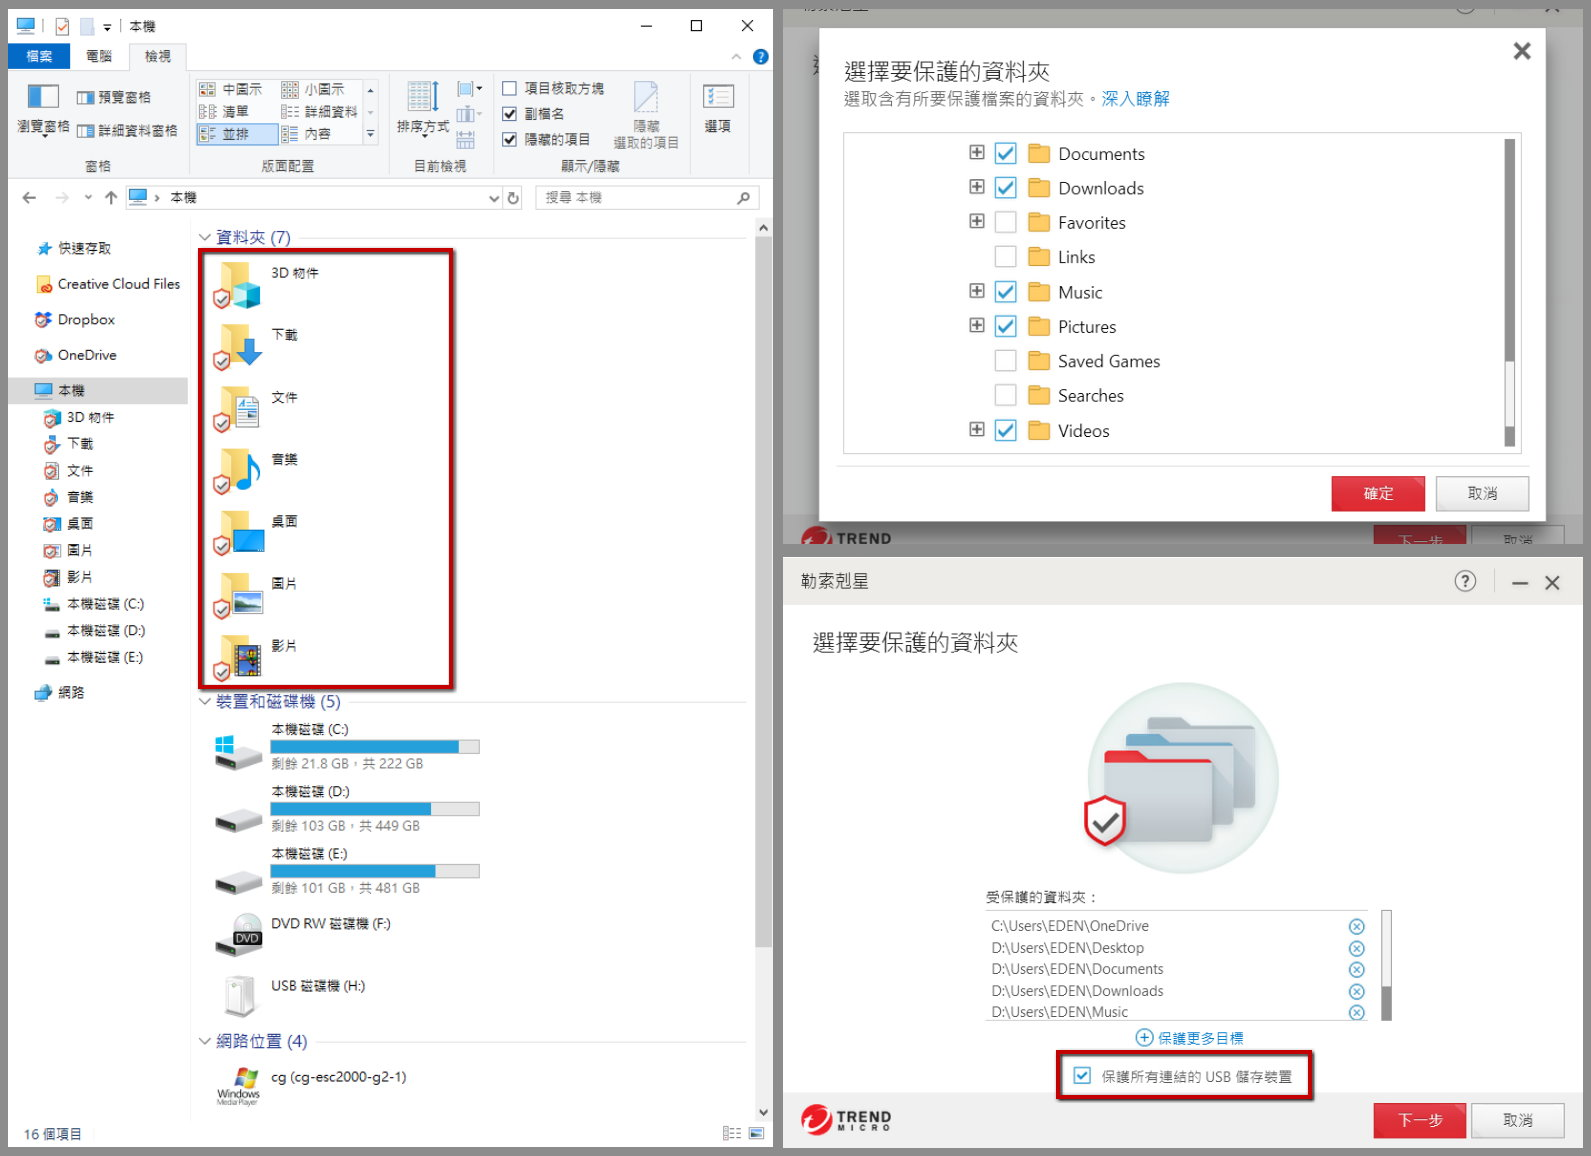 PC-cillin 2020 雲端版 電腦安全教戰守則 三部曲:電腦安全與資料防護(上)